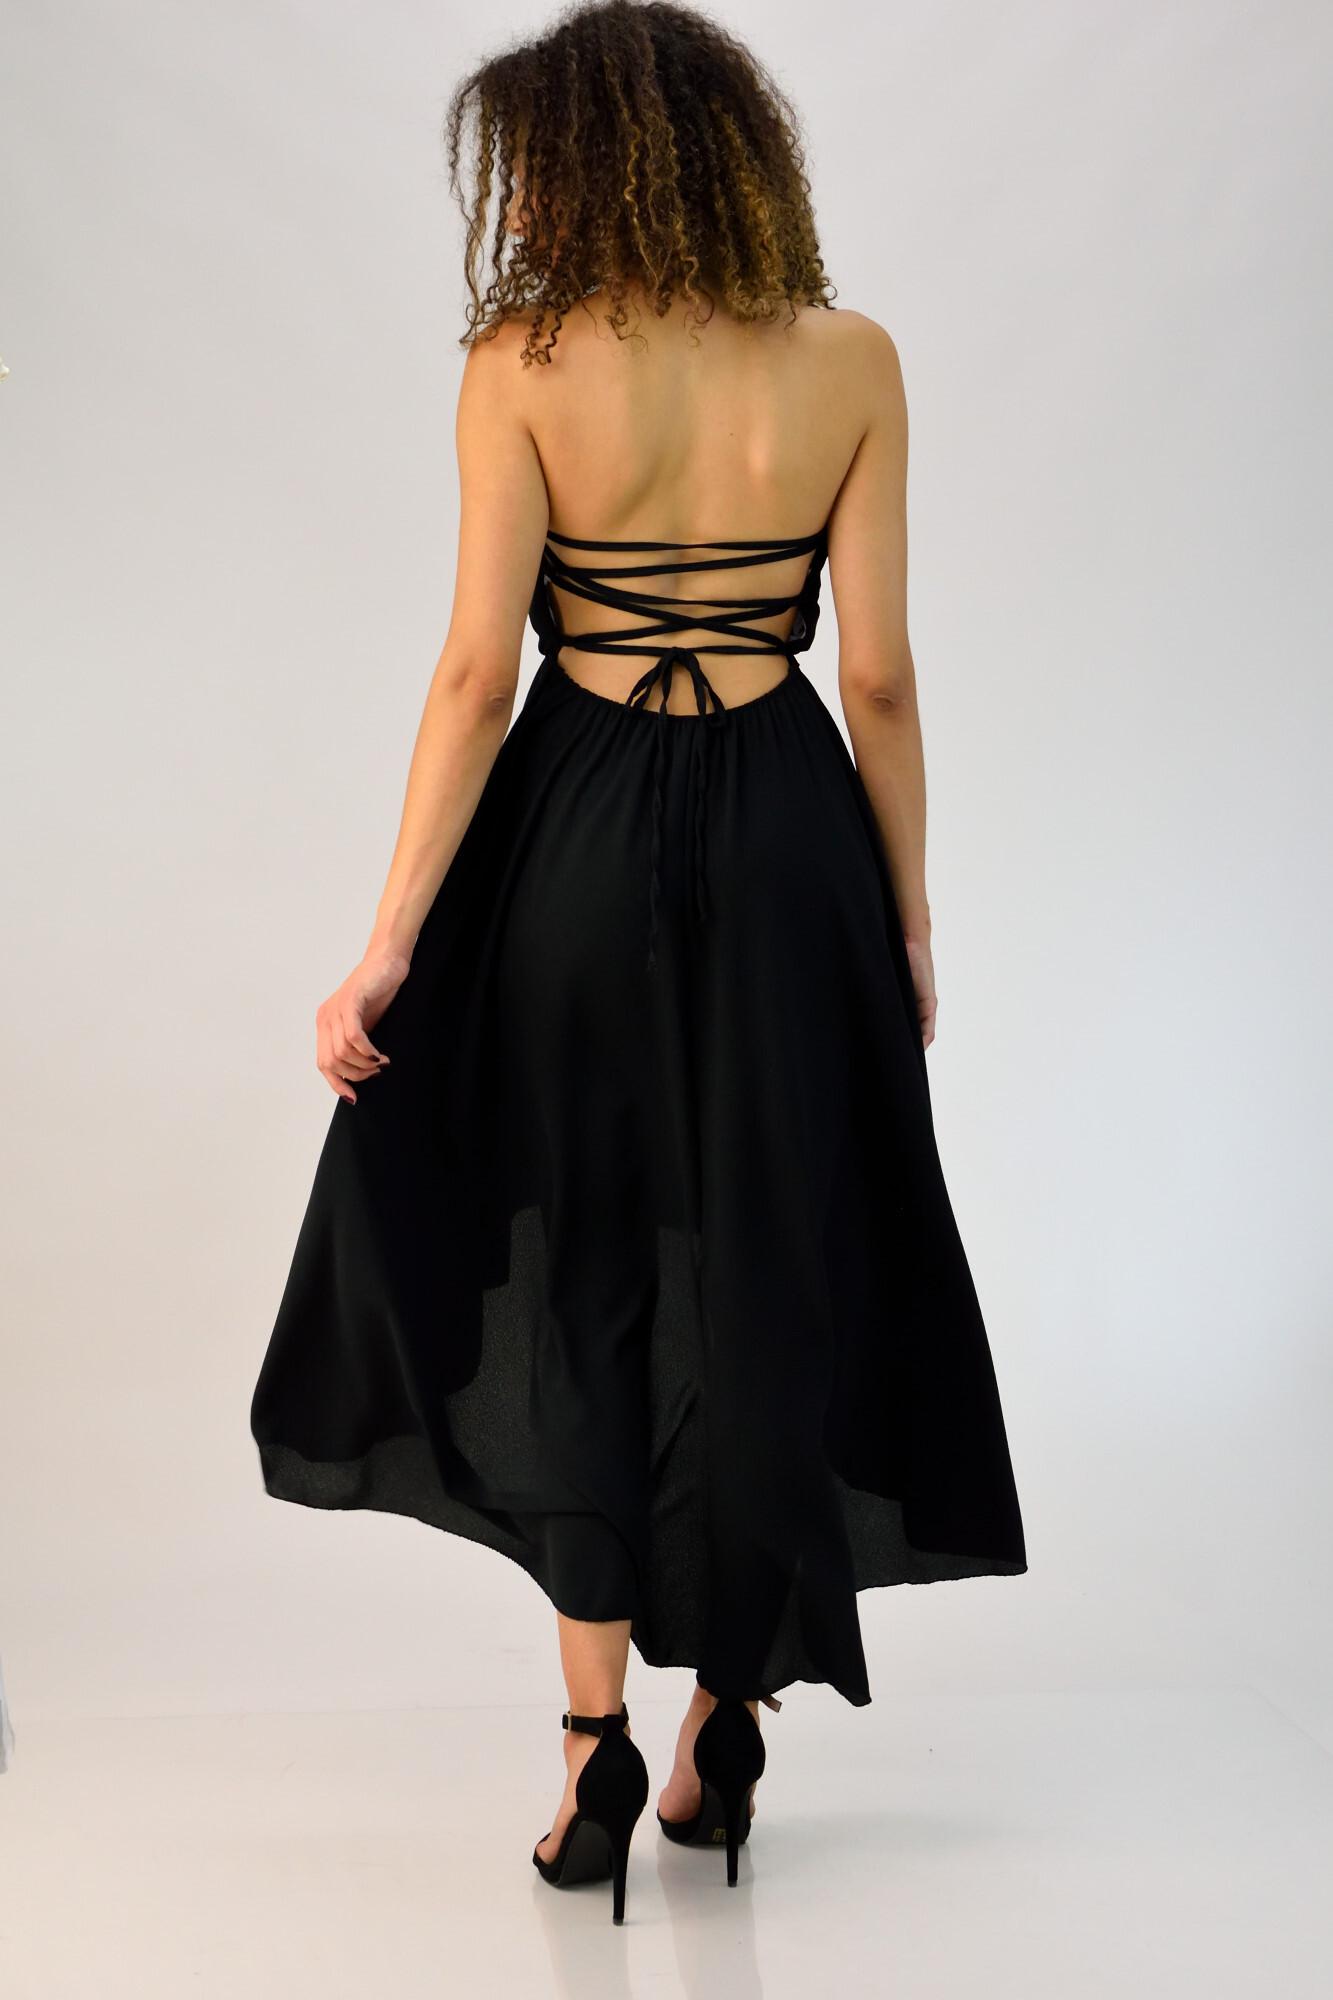 43743906a686 Φόρεμα στράπλες με ανοιχτή πλάτη. Tap to expand